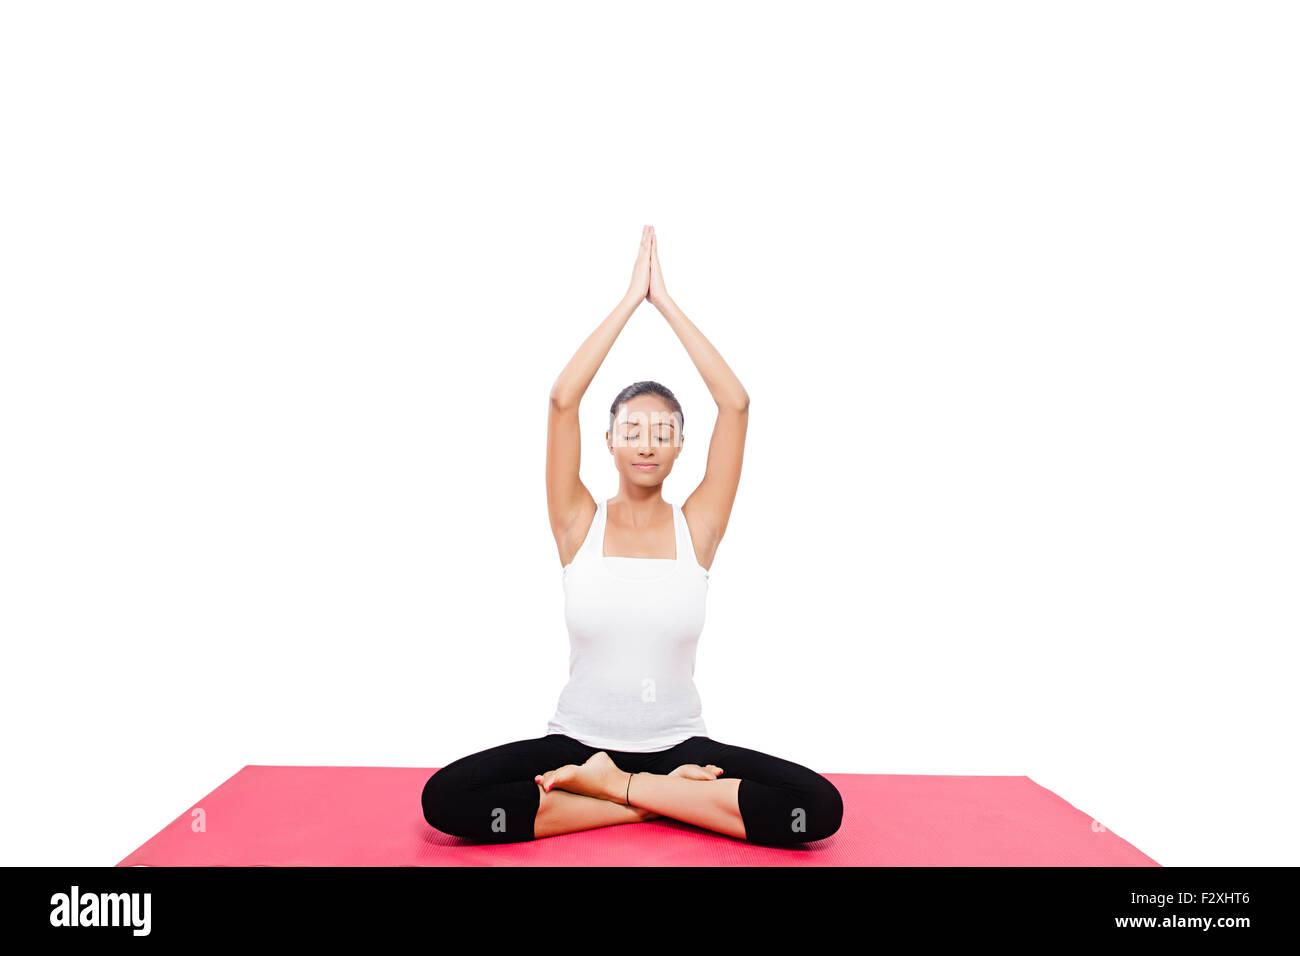 1 indian Adult Woman Yoga Surya Namaskar - Stock Image